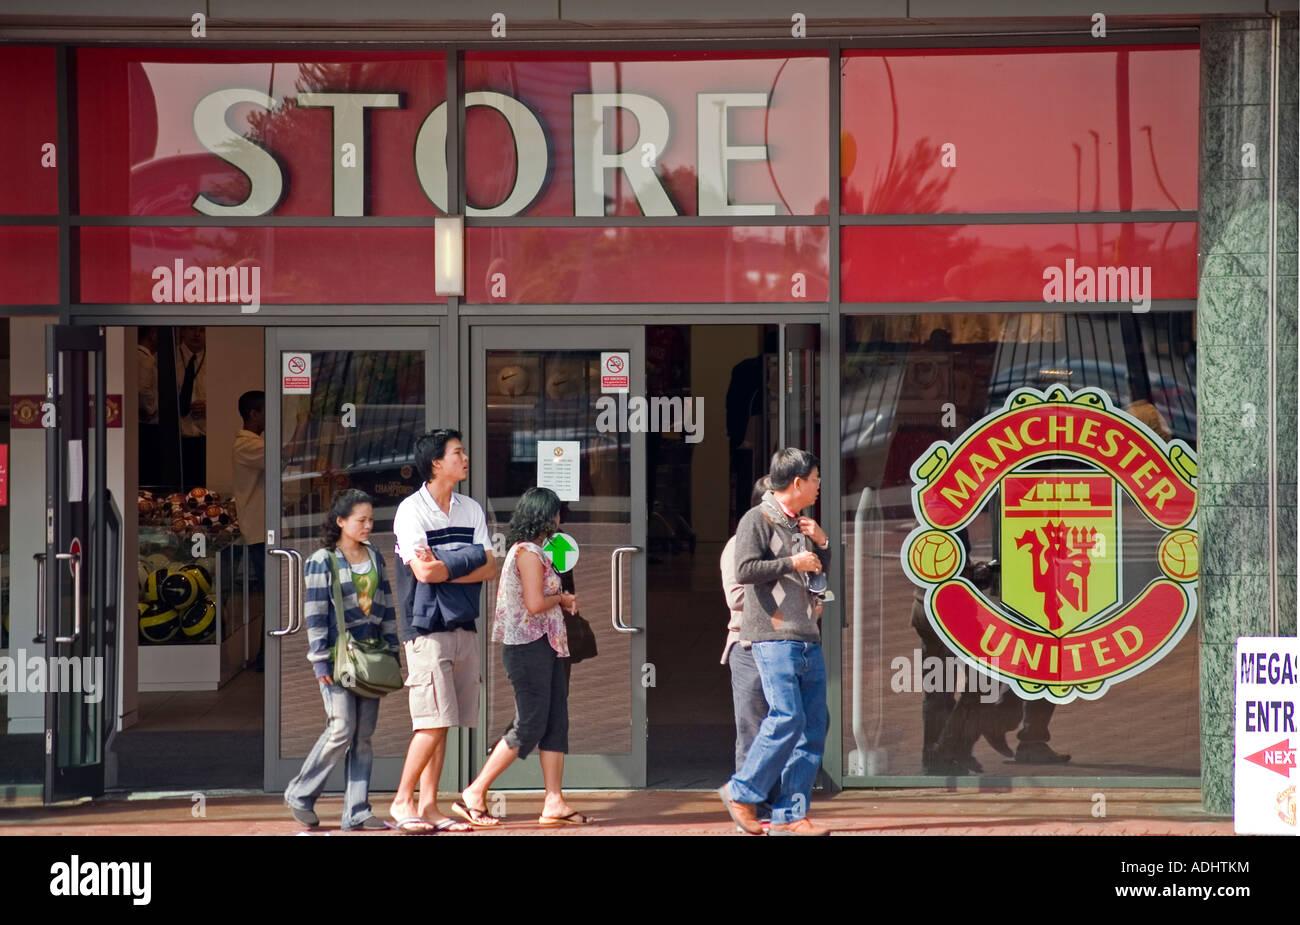 9e2a1b85e98 Tourists at Manchester United Megastore Old Trafford - Stock Image